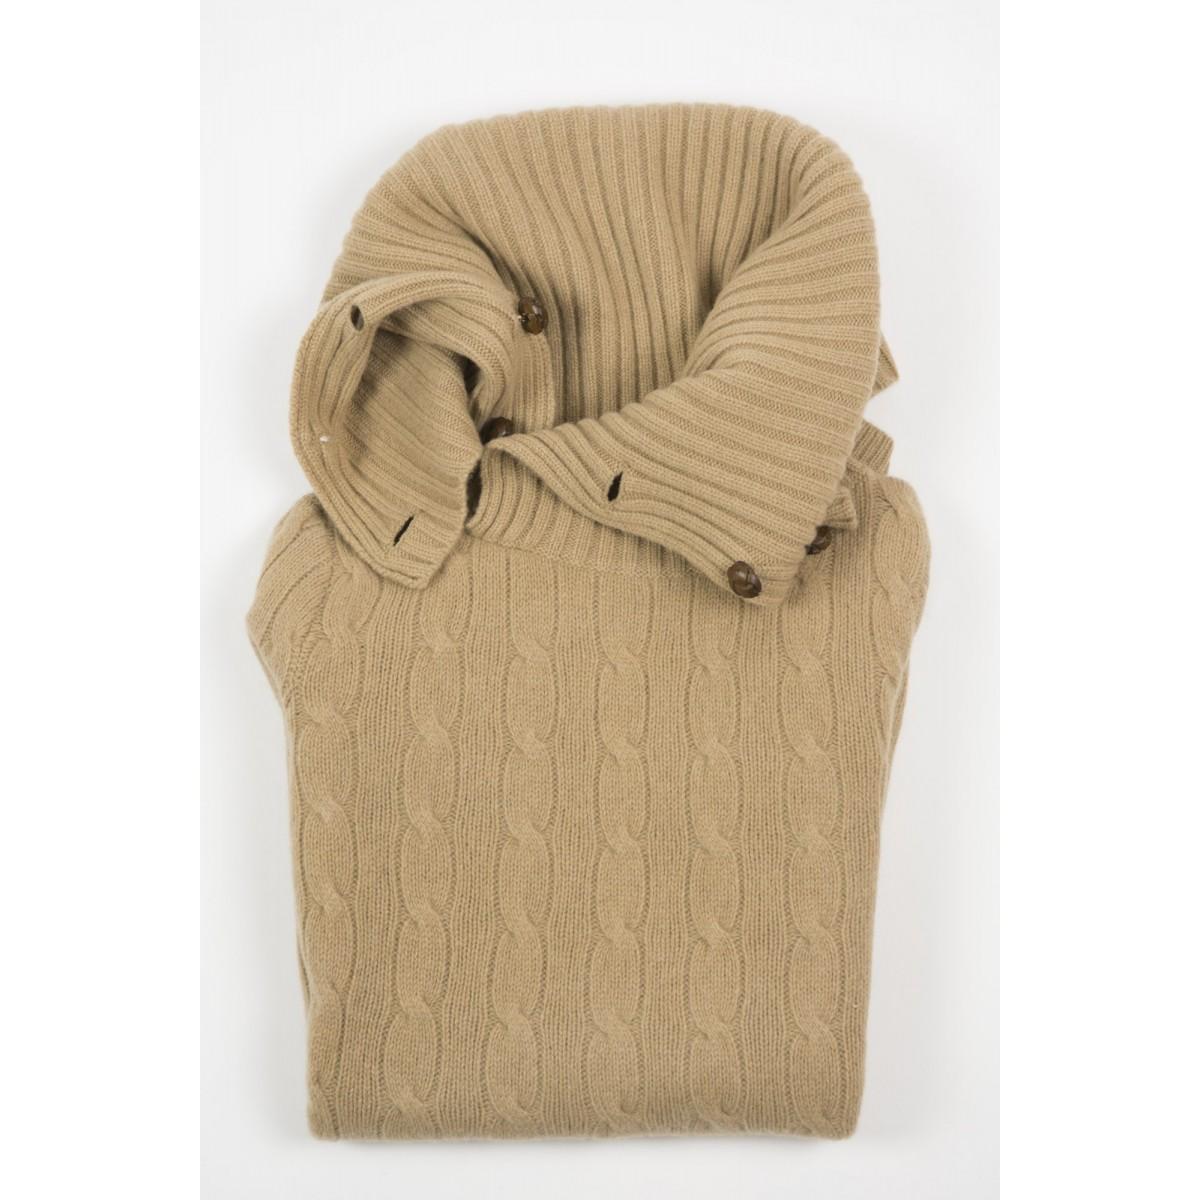 Shirt Polo Ralph Lauren Woman - C39Ixclaw9641 A220A Mgl Collo Maglia Donna Lana